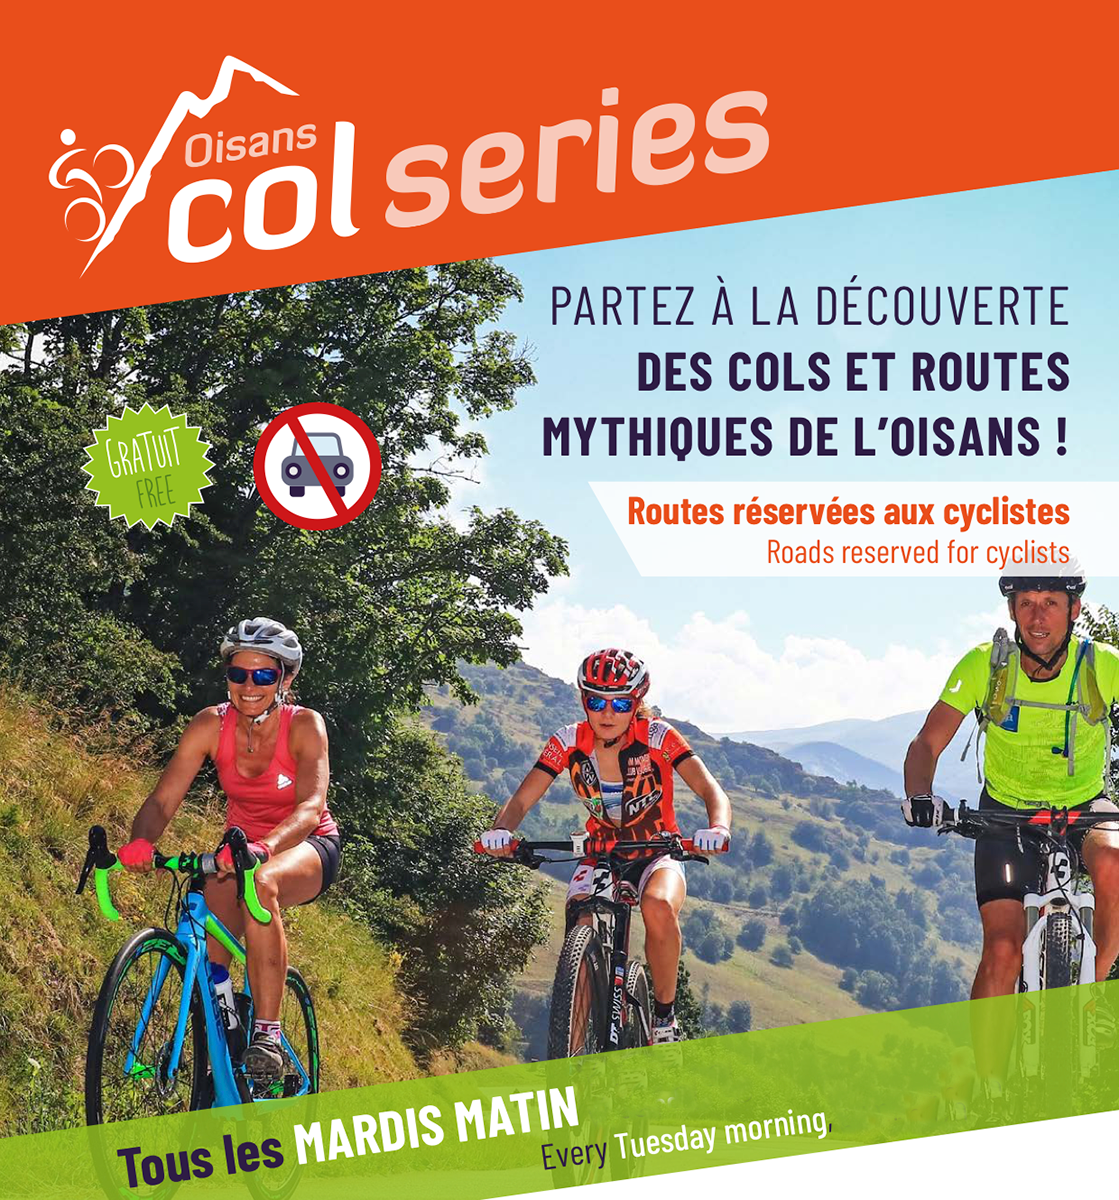 Oisans Col series